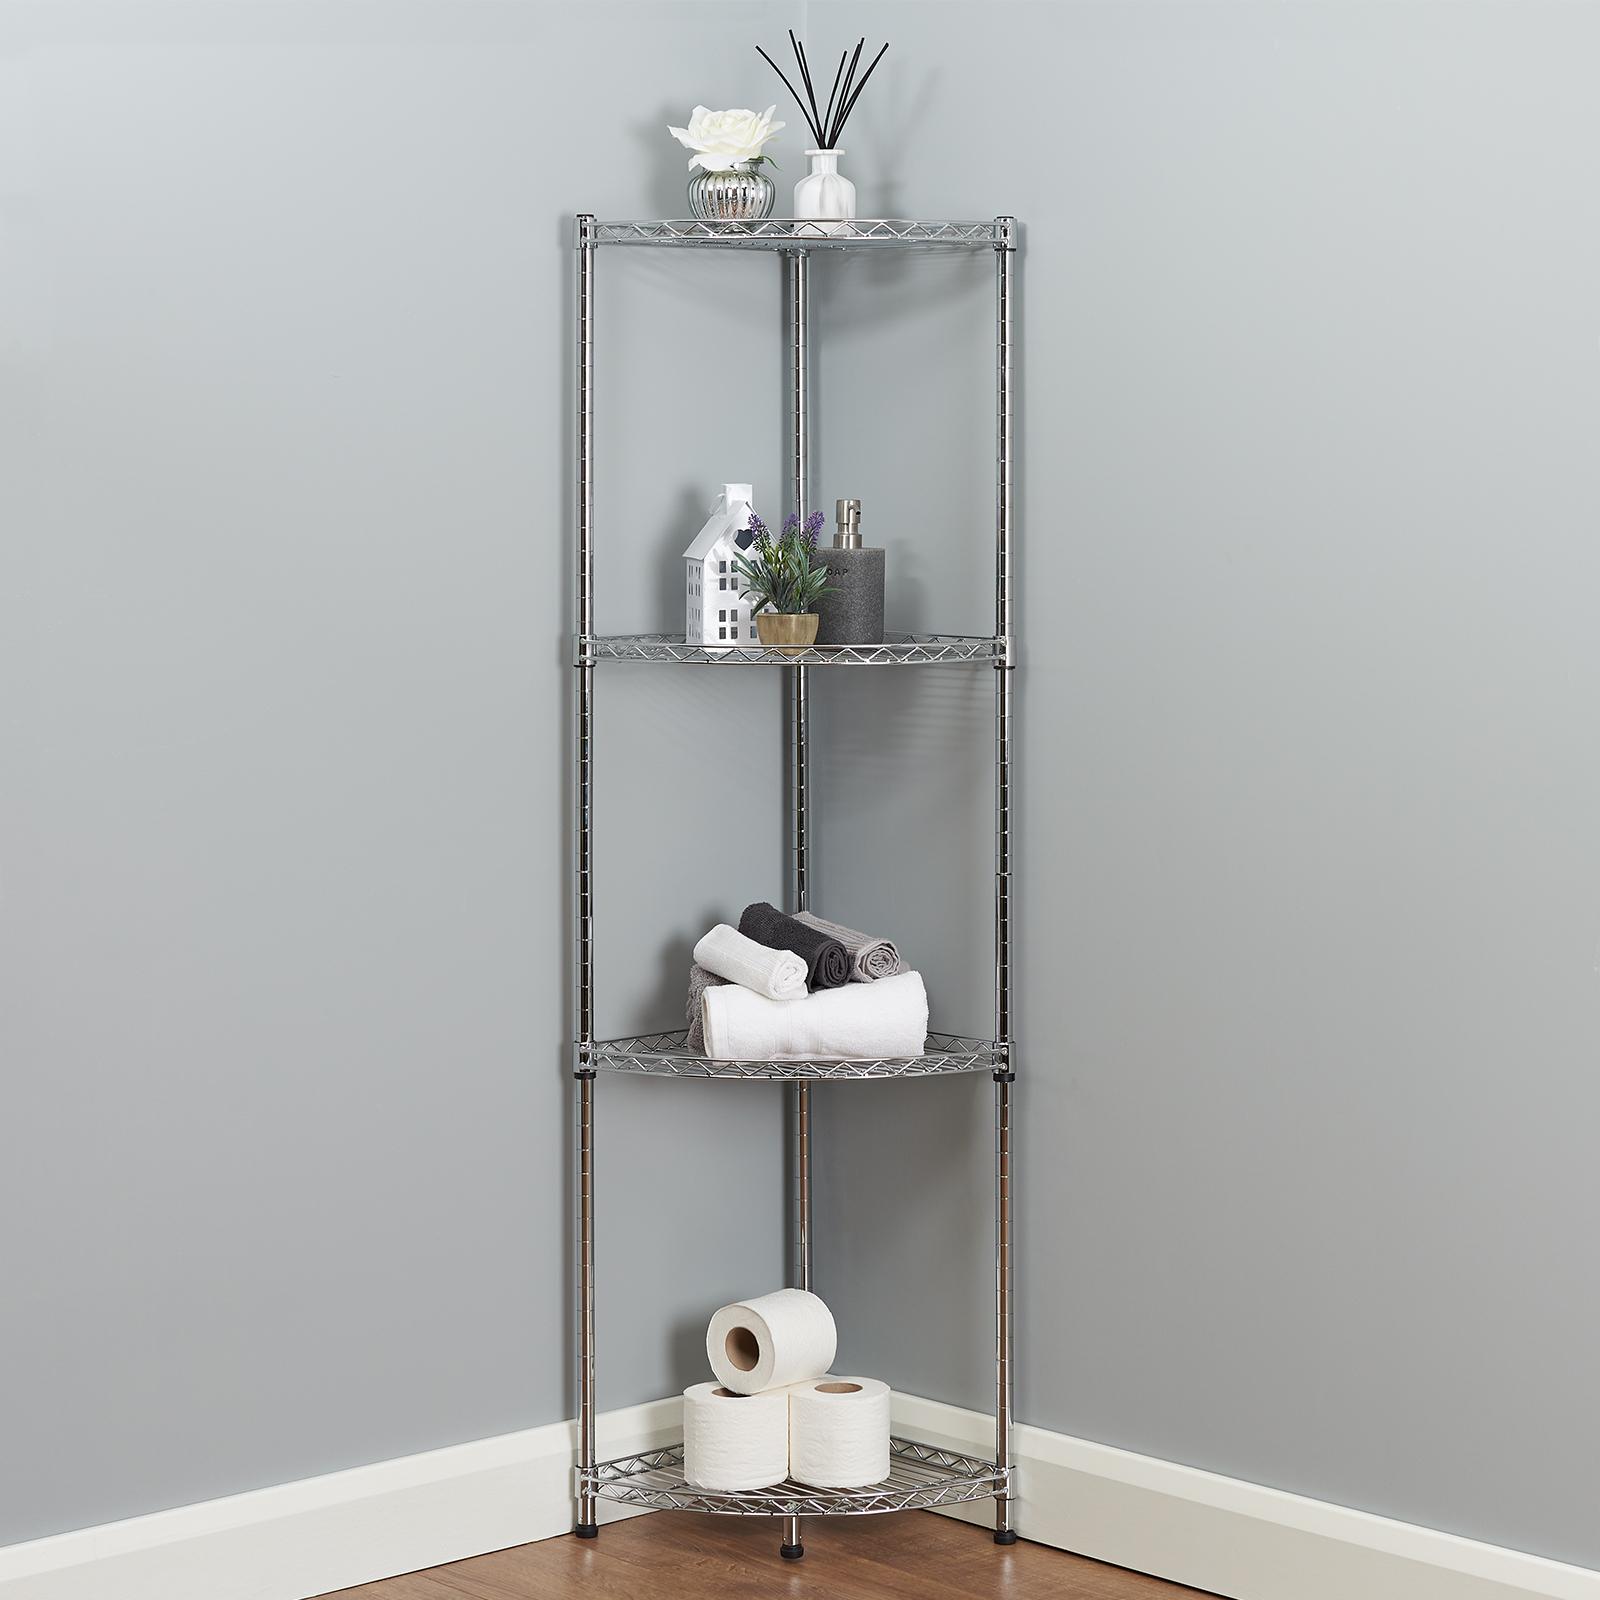 Details About 4 Tier Corner Bathroom Storage Shelves Metal Chrome Shelving Unit Display Rack throughout size 1600 X 1600